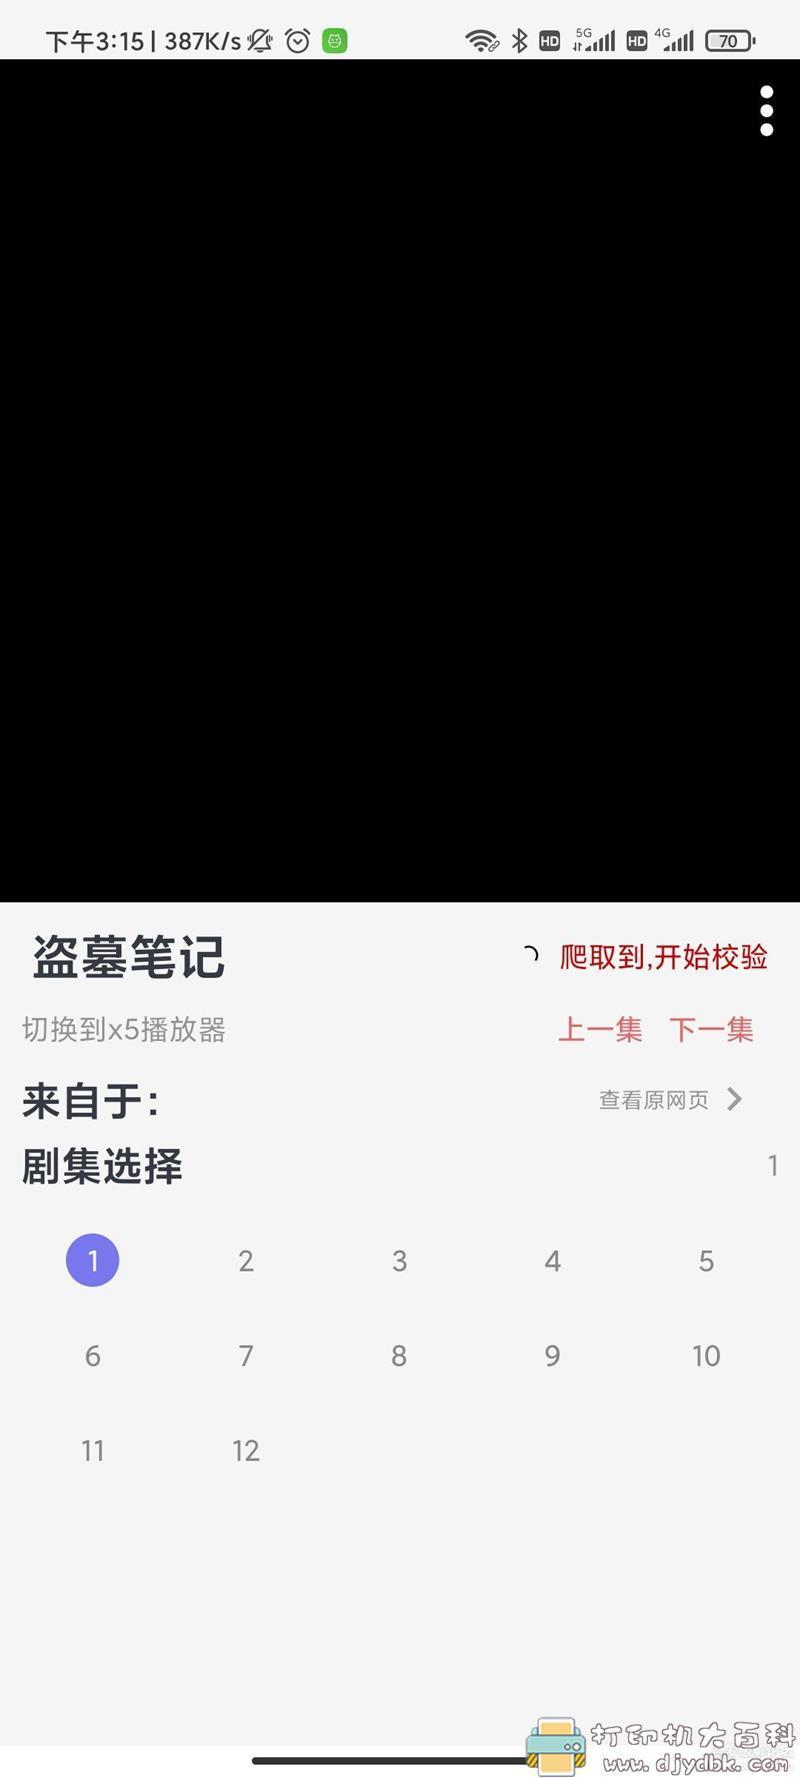 [Android]雨见浏览器5.9.5 带嗅探功能 秒搜剧 配图 No.3